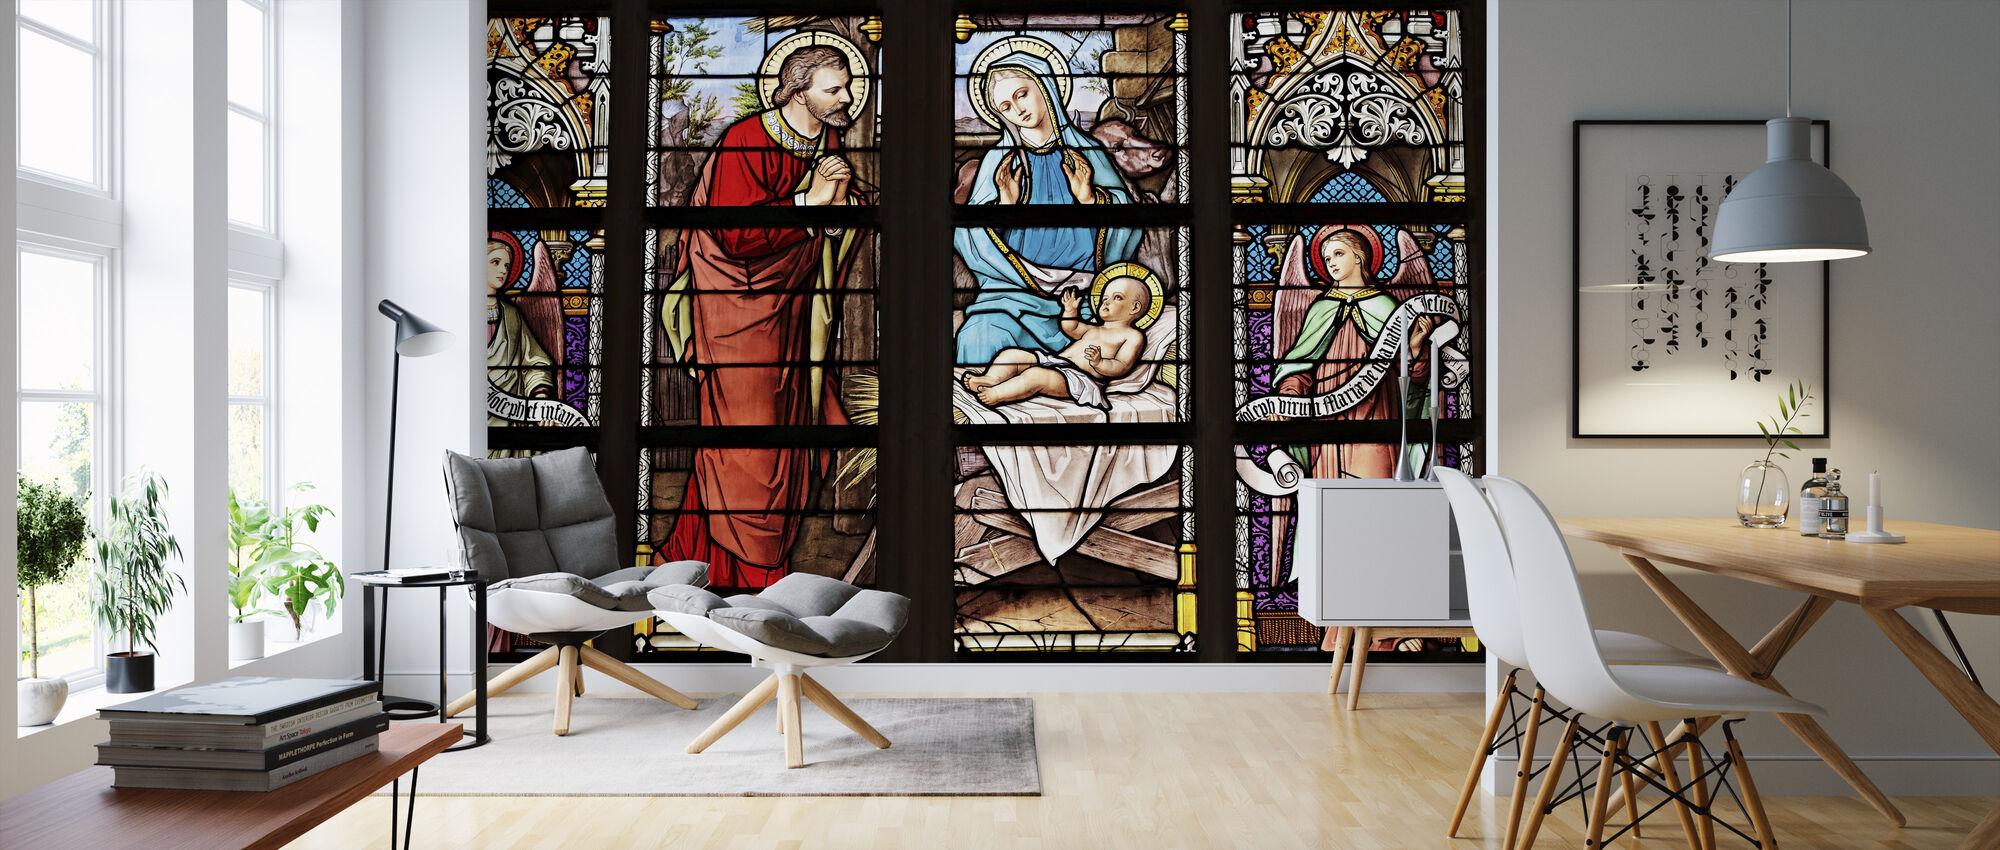 Church Window - Wallpaper - Living Room